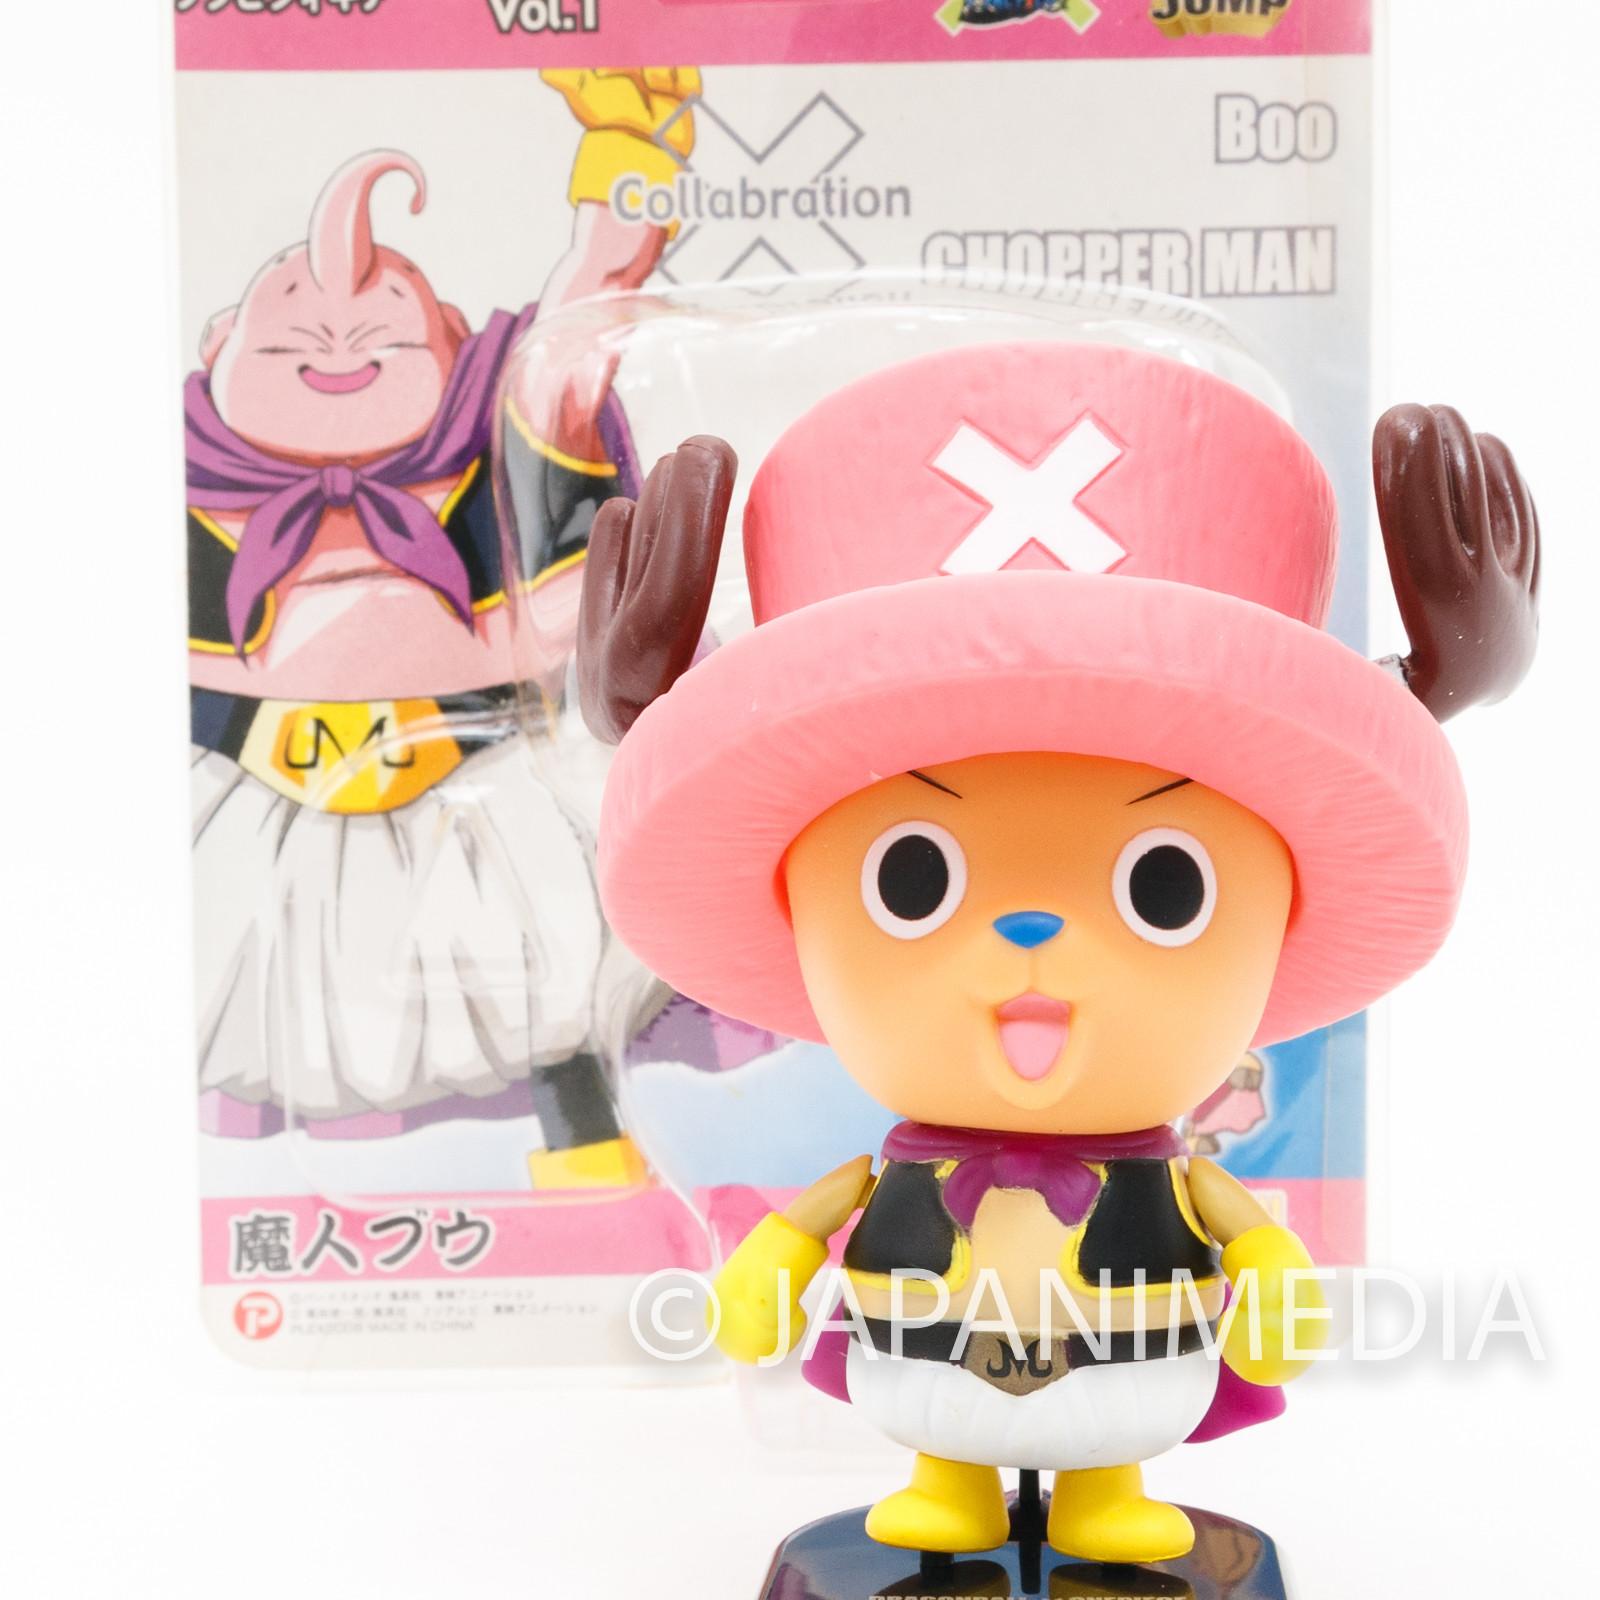 Dragon Ball Z x ONE PIECE Chopper Man x Majin Boo Sofubi Figure JAPAN ANIME